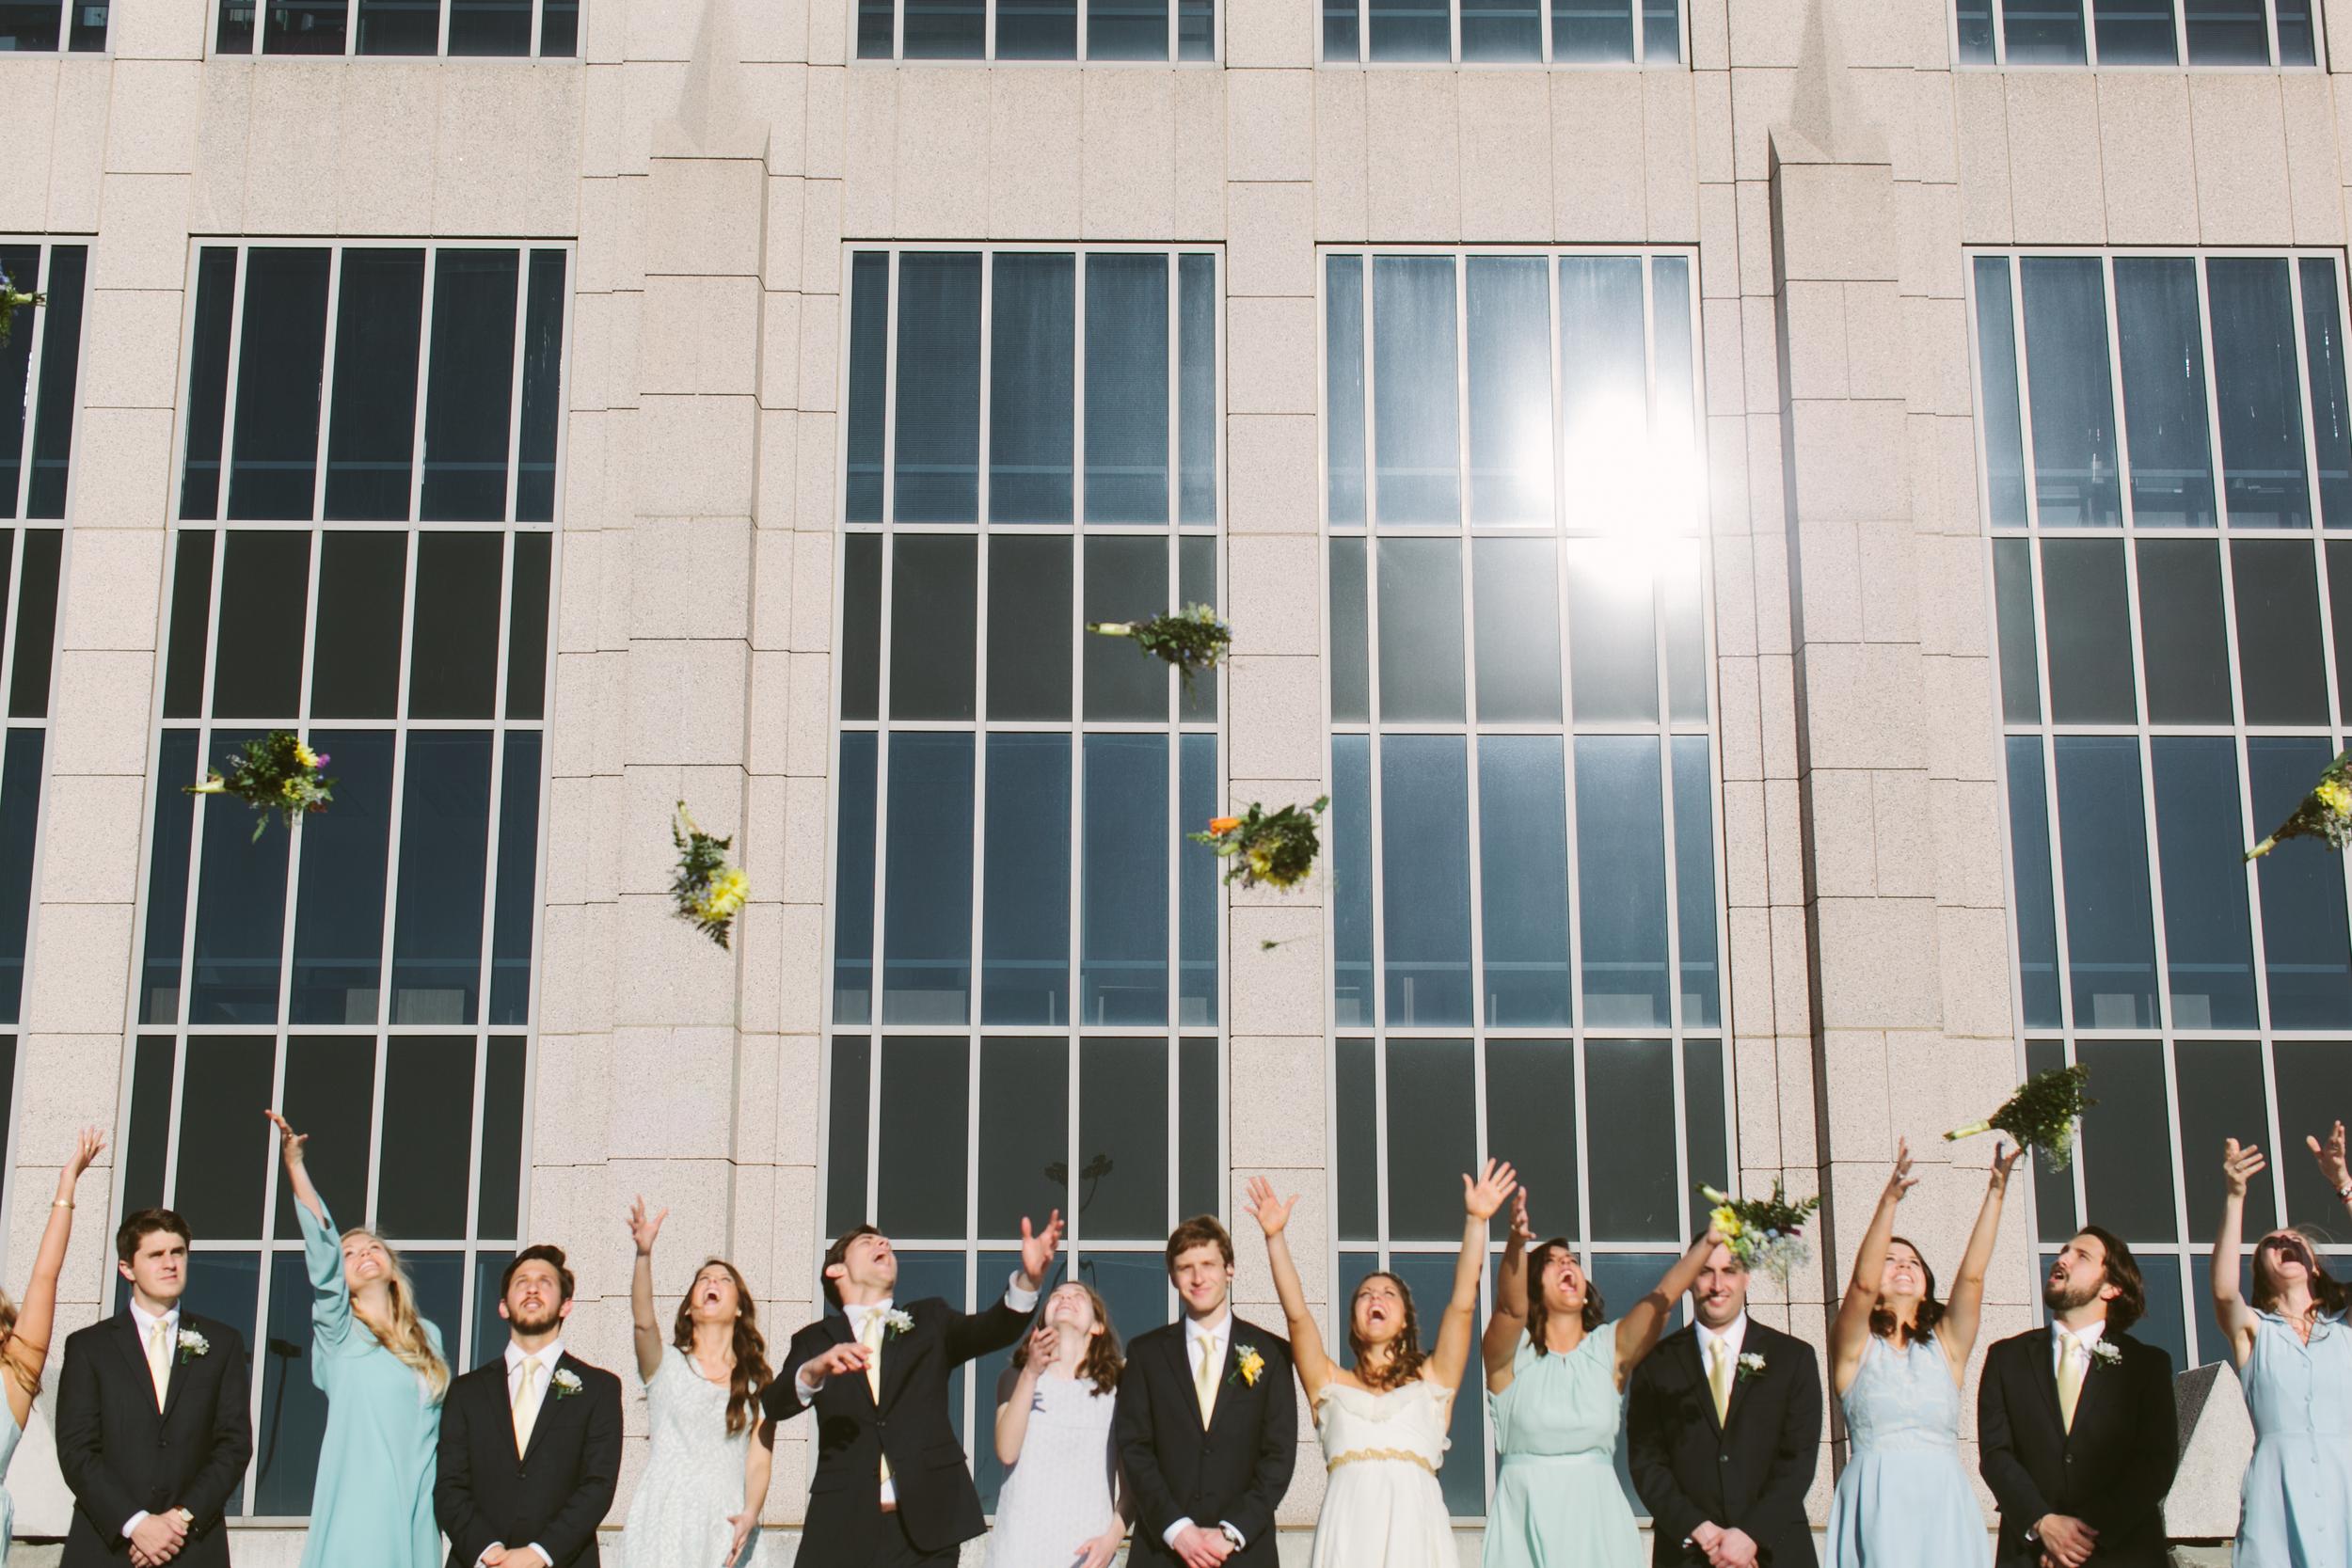 Kathryn-McCrary-Photography-Atlanta-Wedding-Photographer-35.jpg